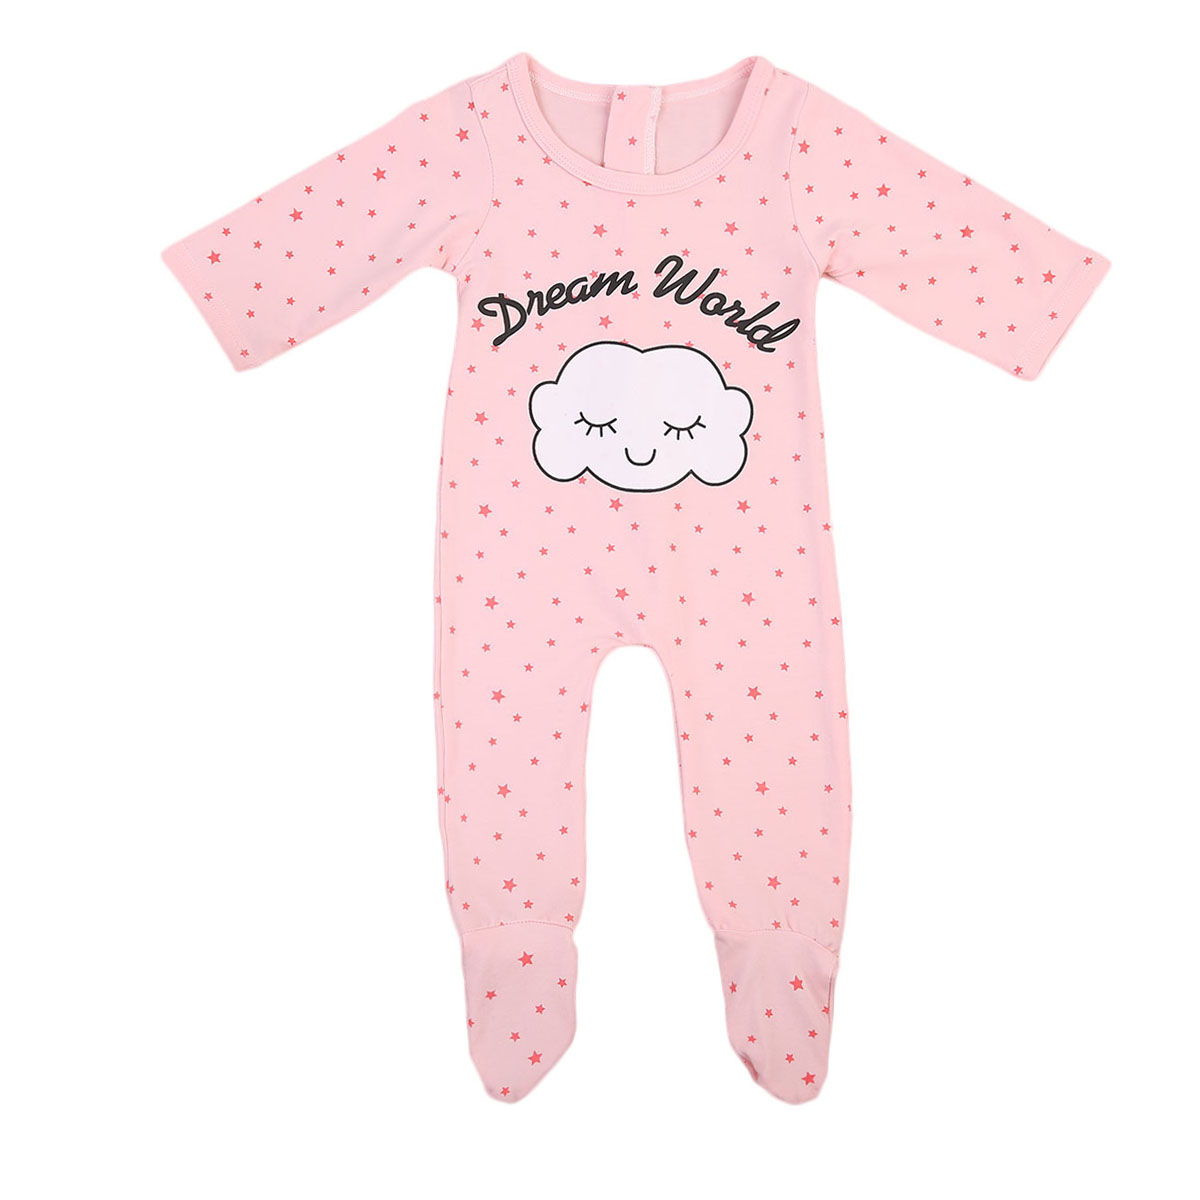 Cute Newborn Baby Girls Long Sleeve Sleepwear Pajamas Romper Jumpsuit Casual Cute Cotton Pink Outfit petit lem little girls flamingo fiesta long sleeve pajamas